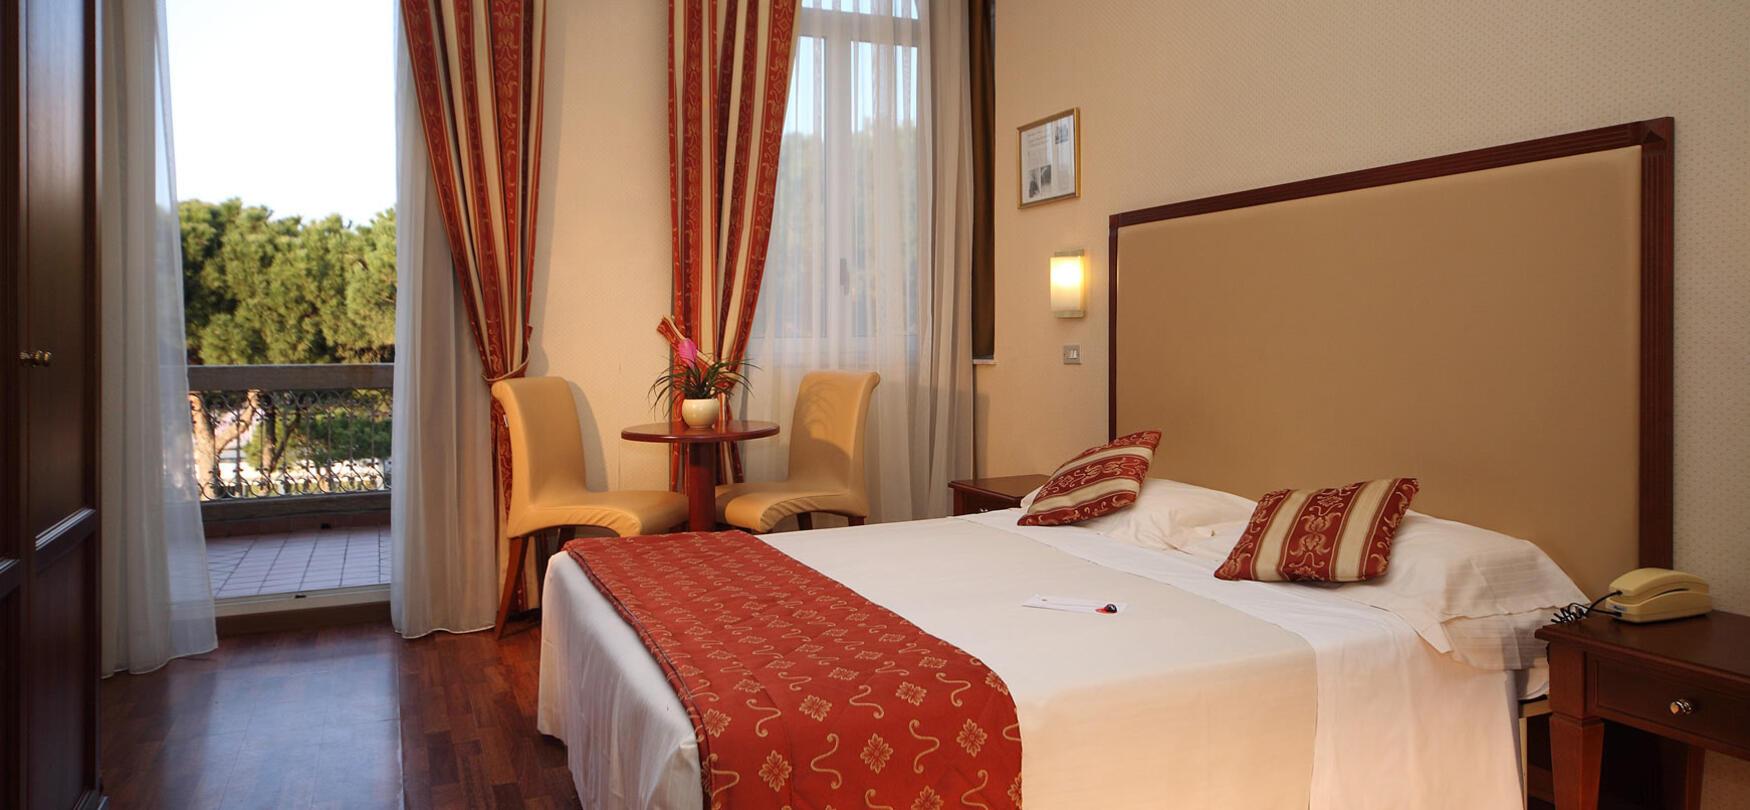 ambienthotels fr chambres-villa-adriatica 005